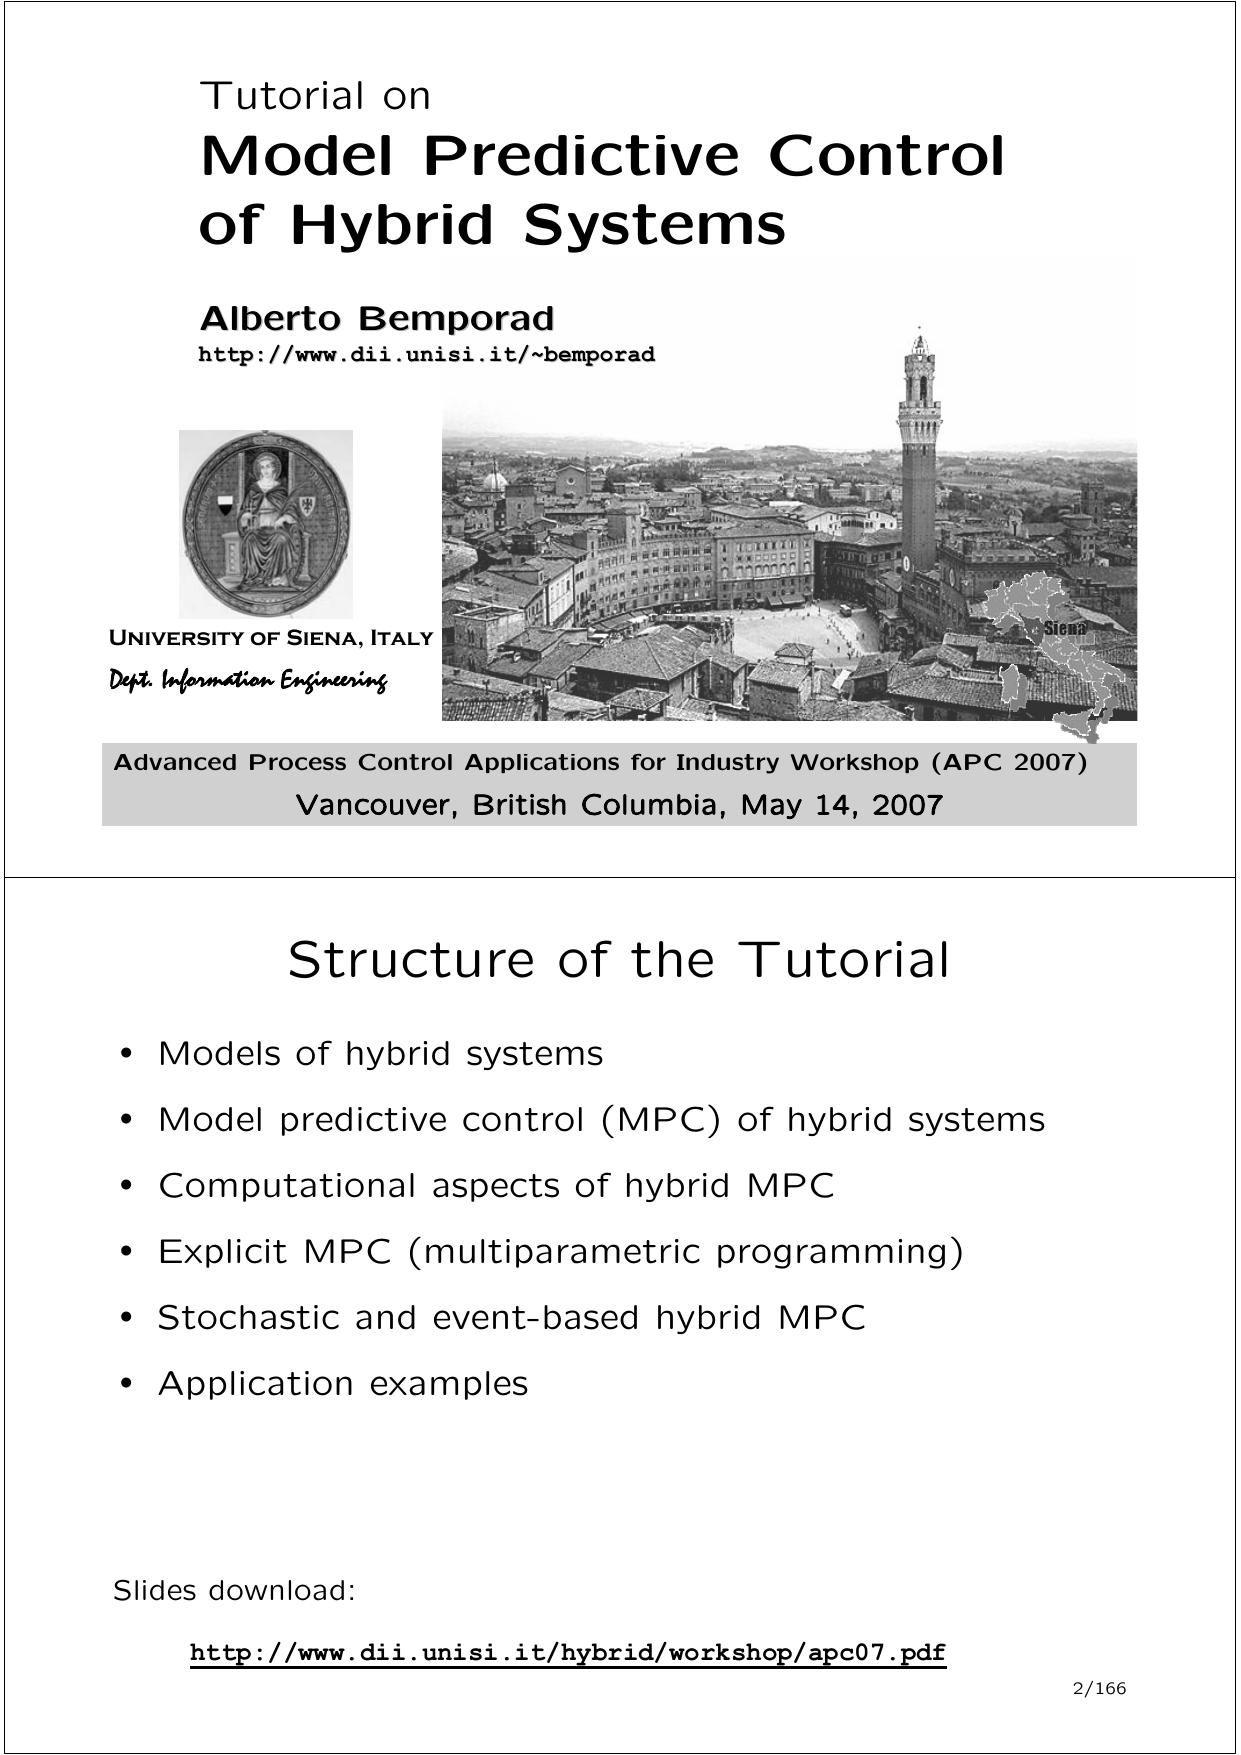 Model Predictive Control of Hybrid Systems